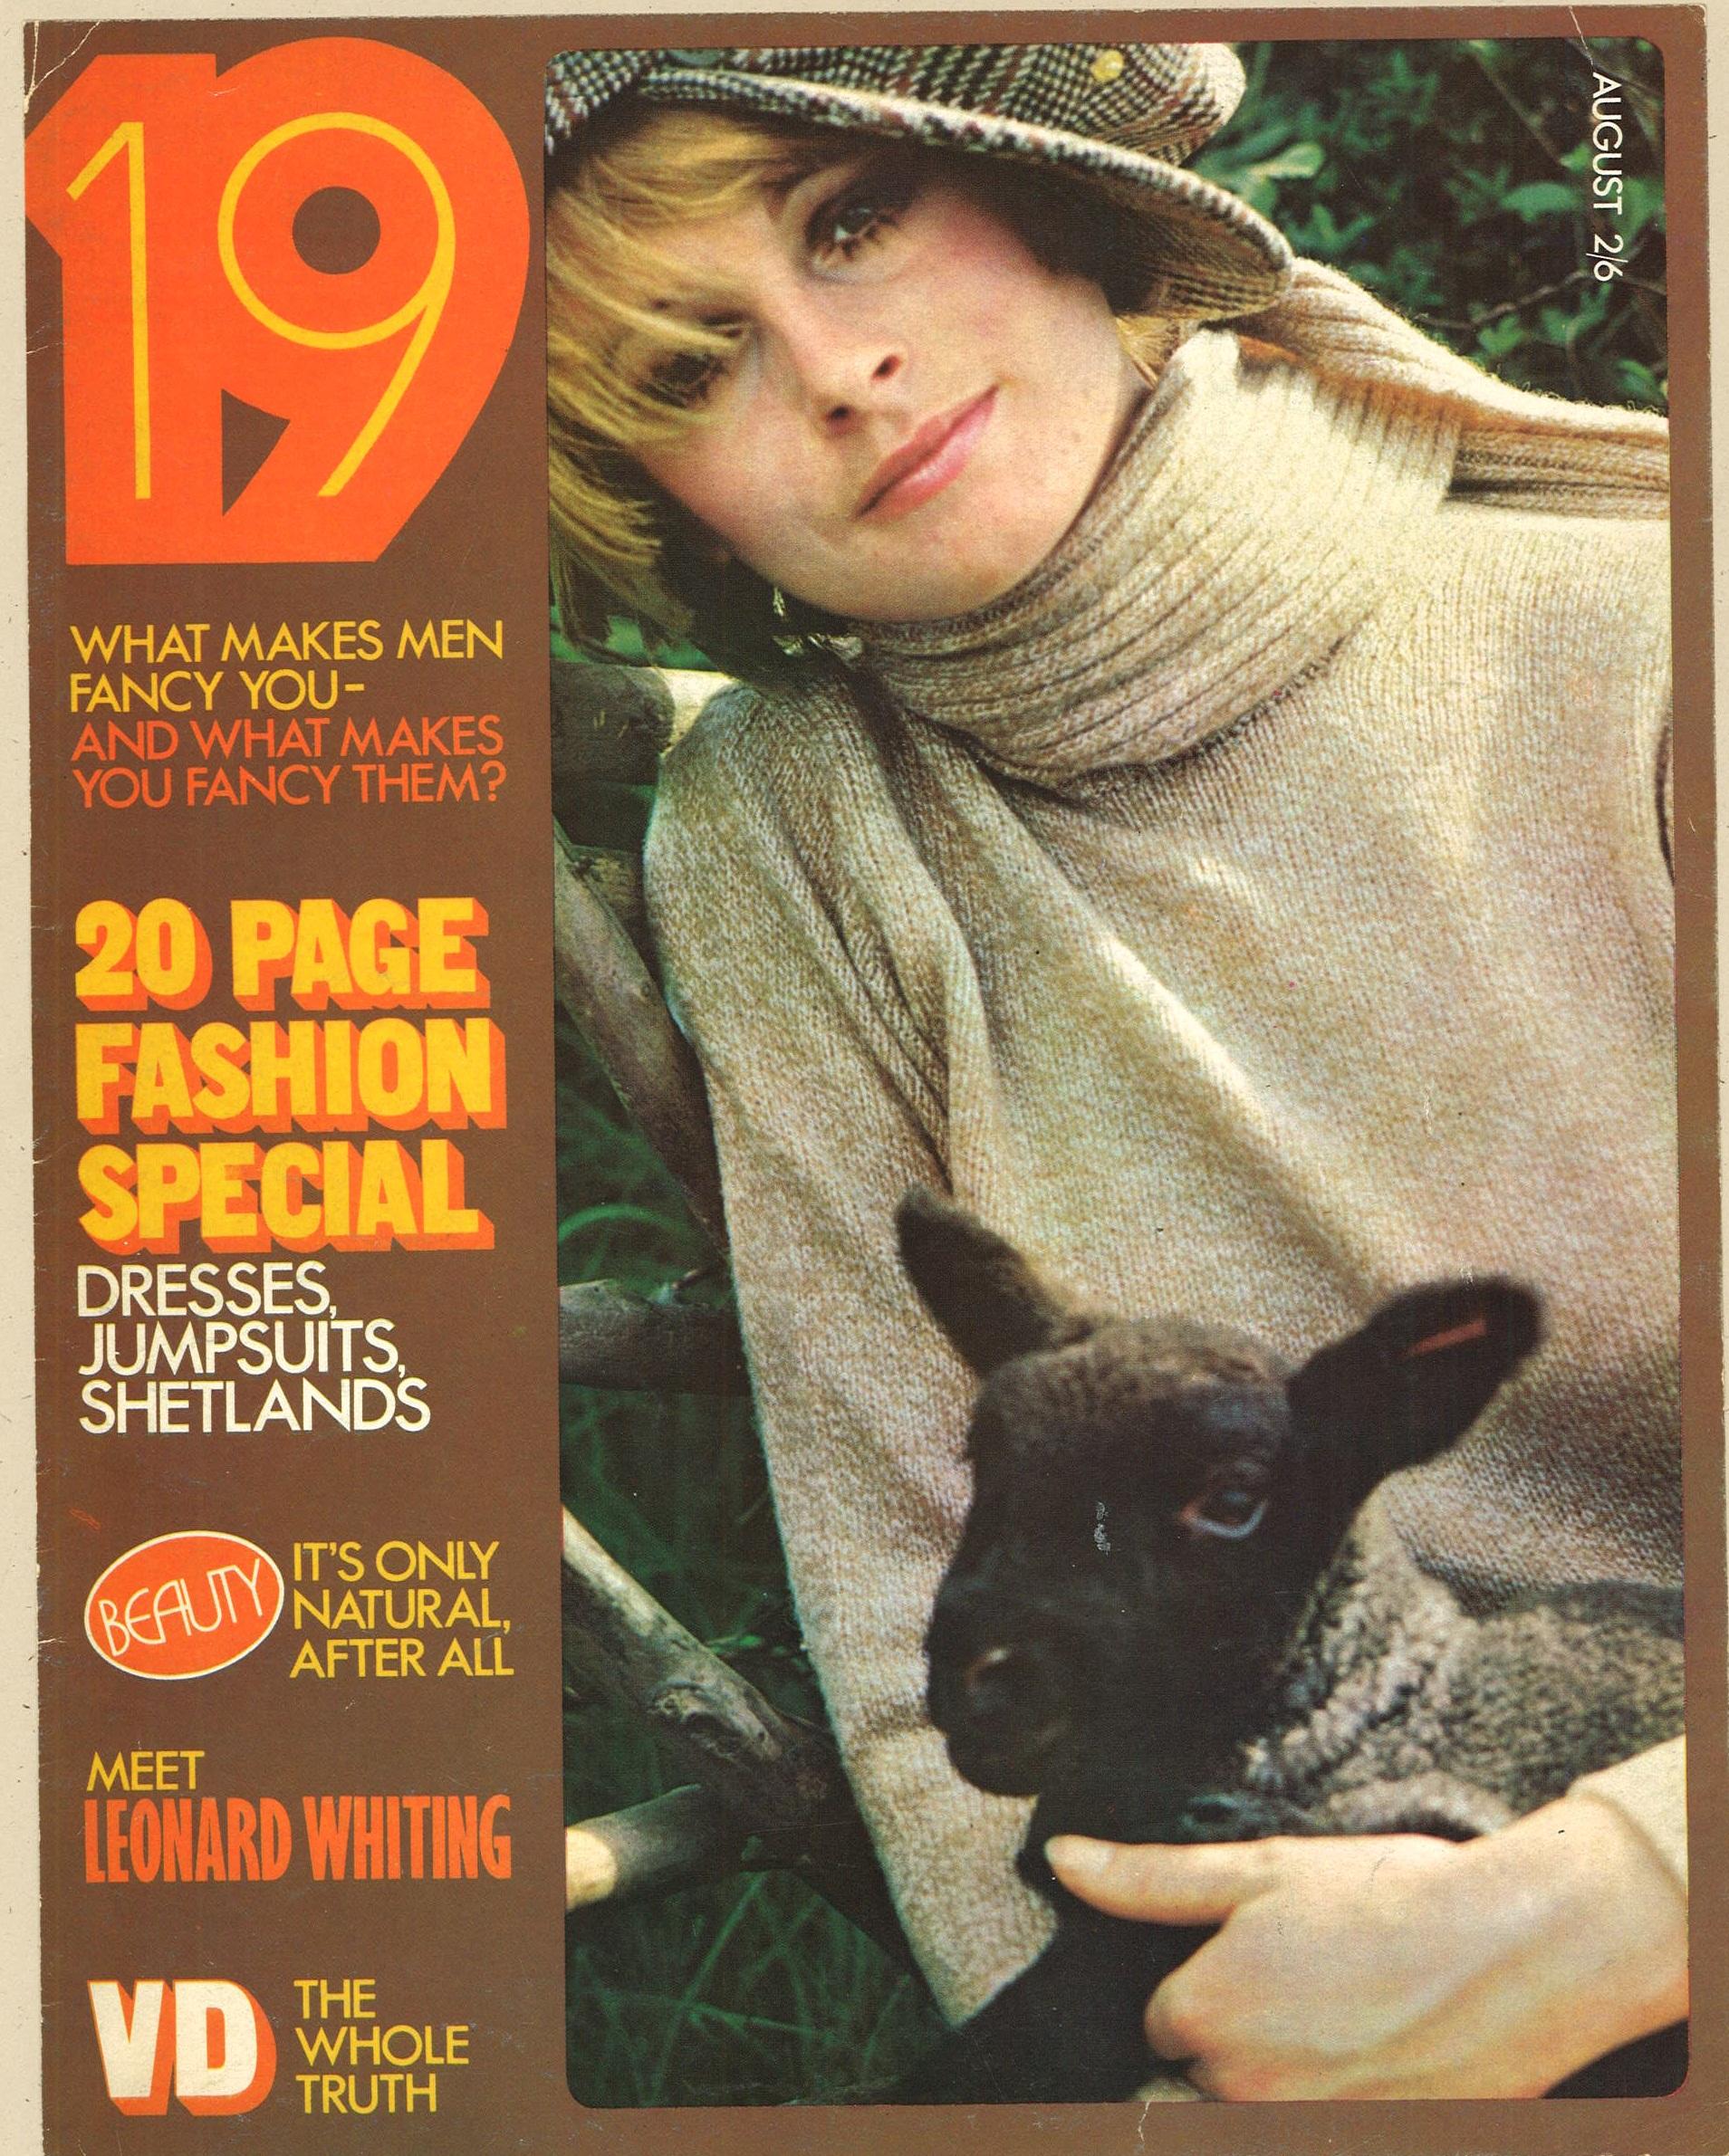 Desi Arnaz Jr Magazine Covers 1960 1969 Sva Library Picture